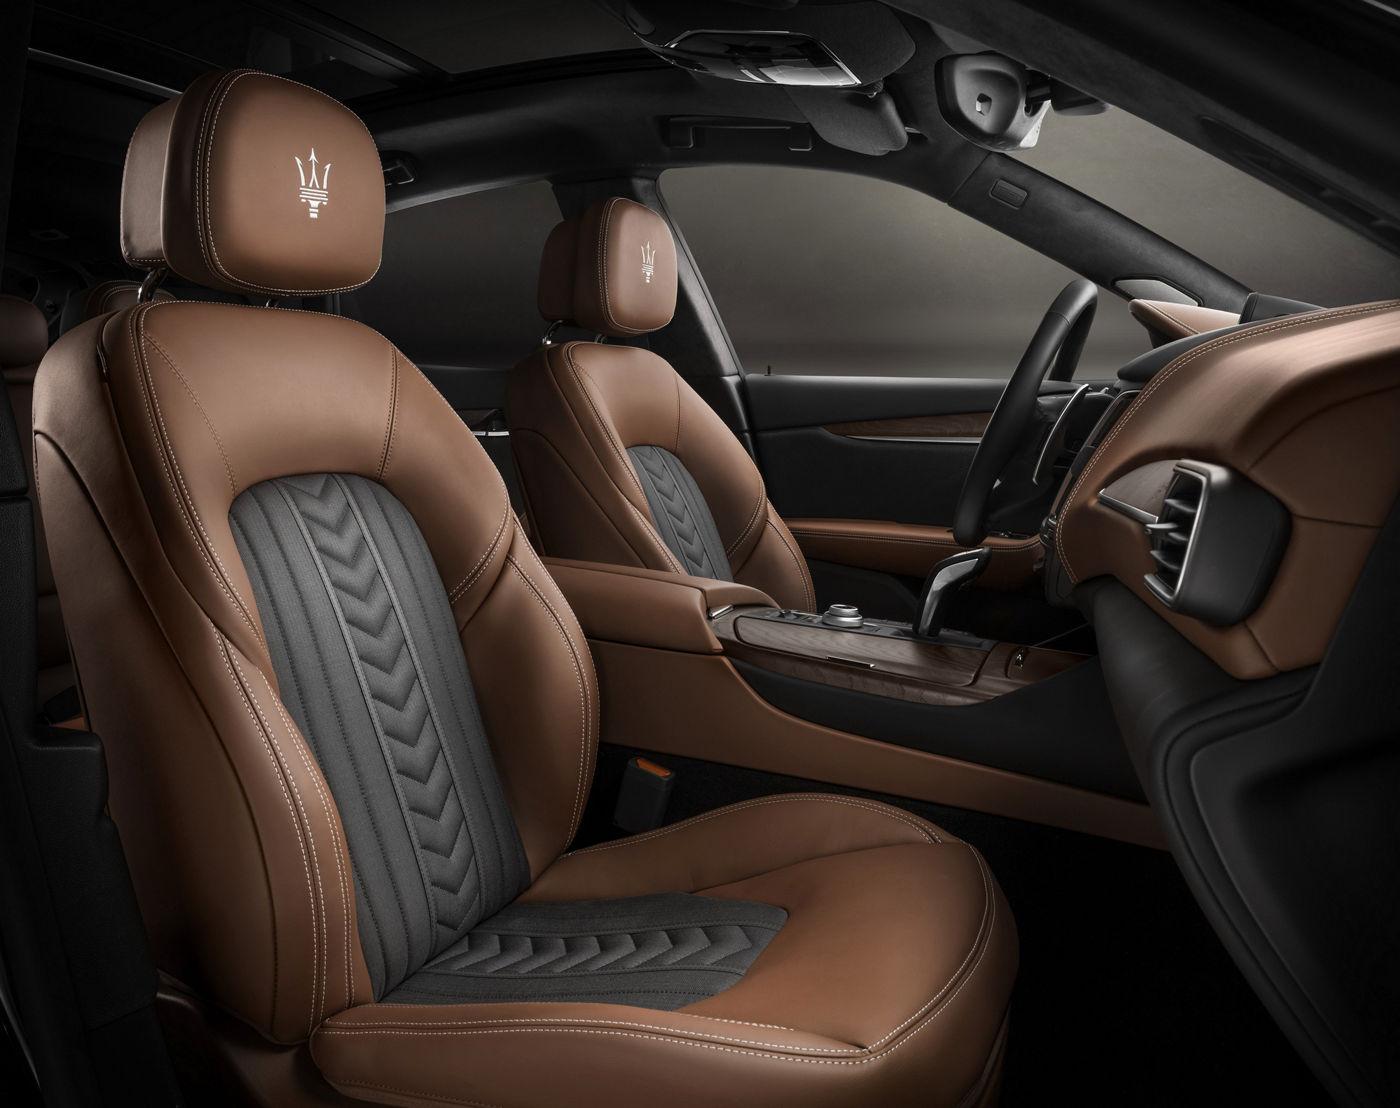 Maserati und Ermenegildo Zegna: Innenausstattung des Luxus-SUVs Levante